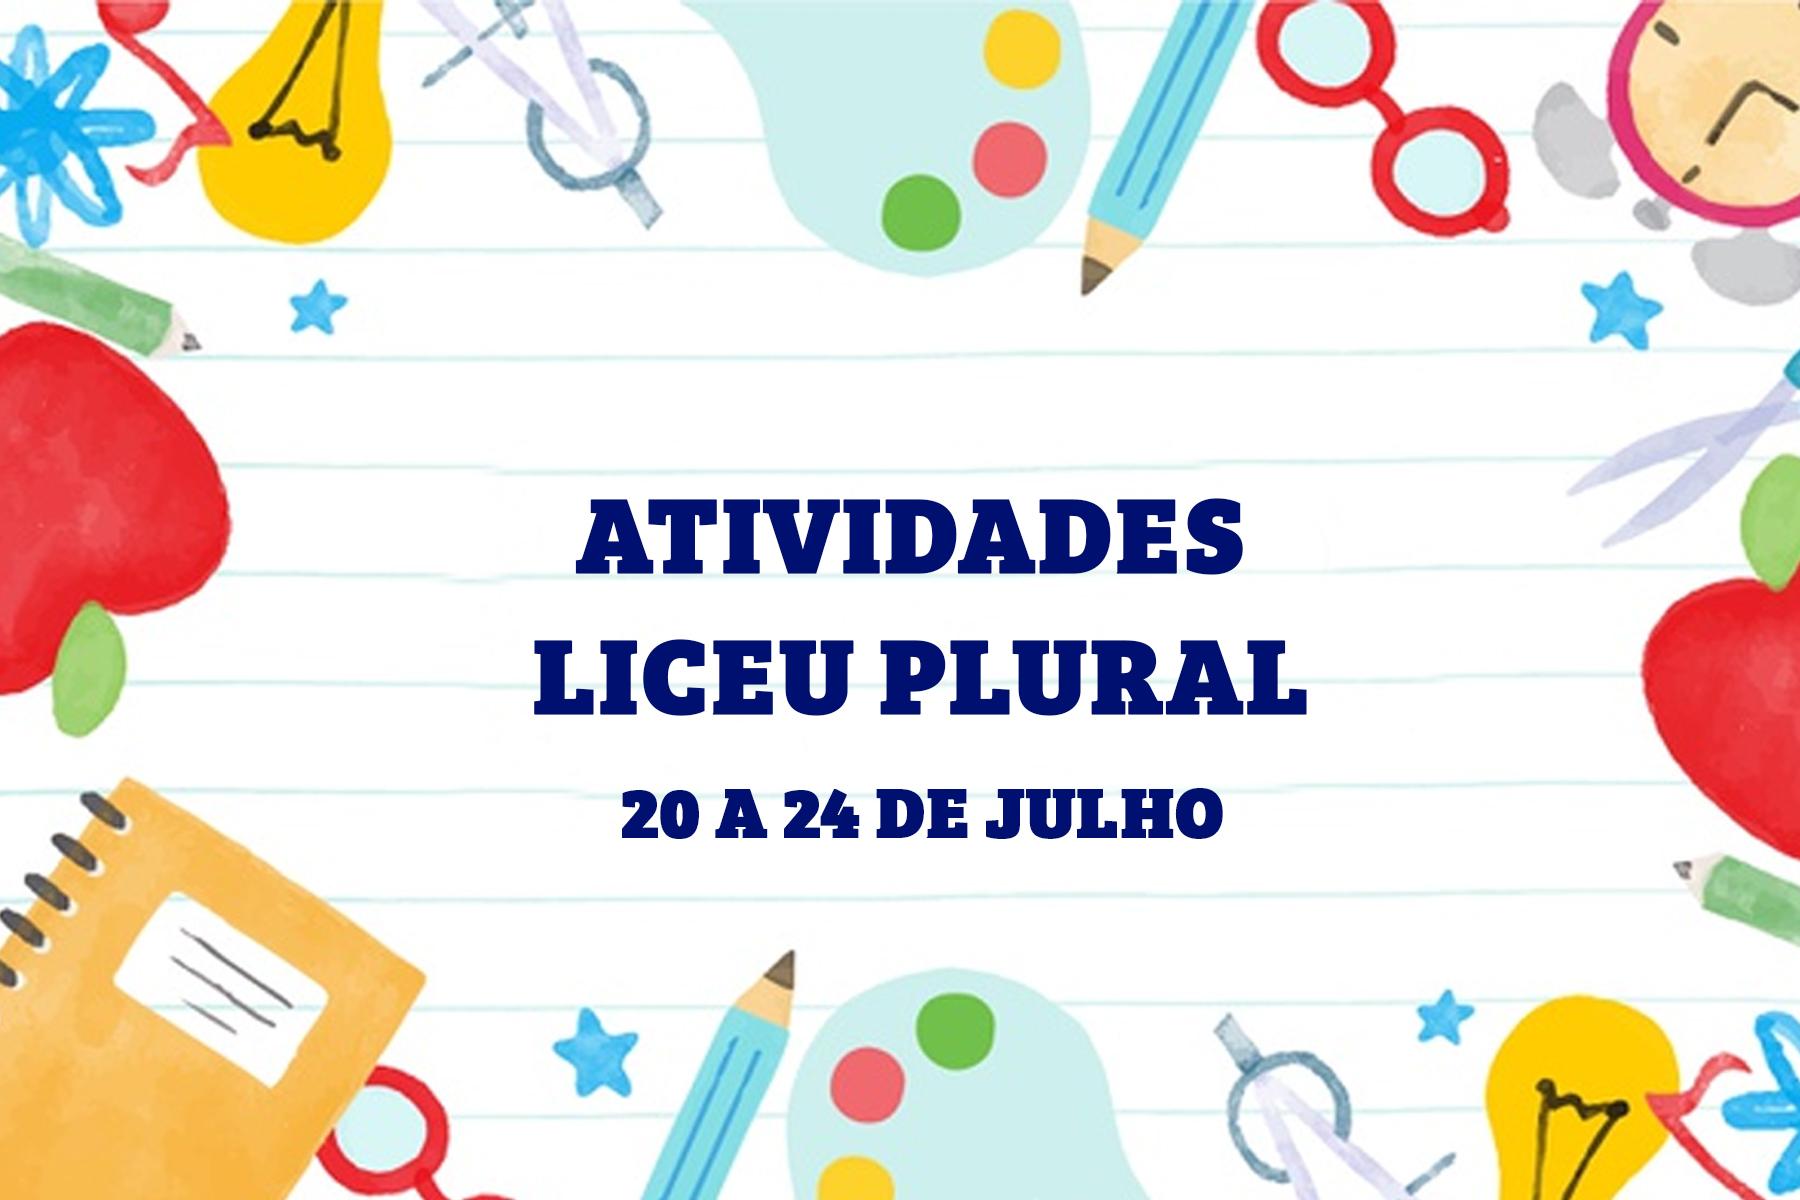 ATIVIDADES | LICEU PLURAL – 20 A 24 DE JULHO